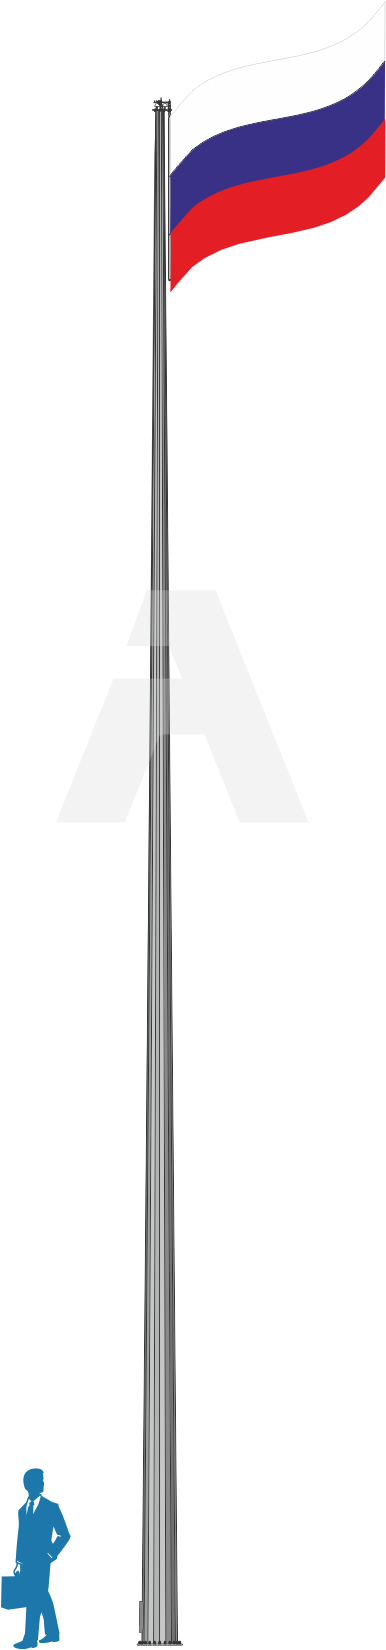 Флагштоки уличные (до 30 м)